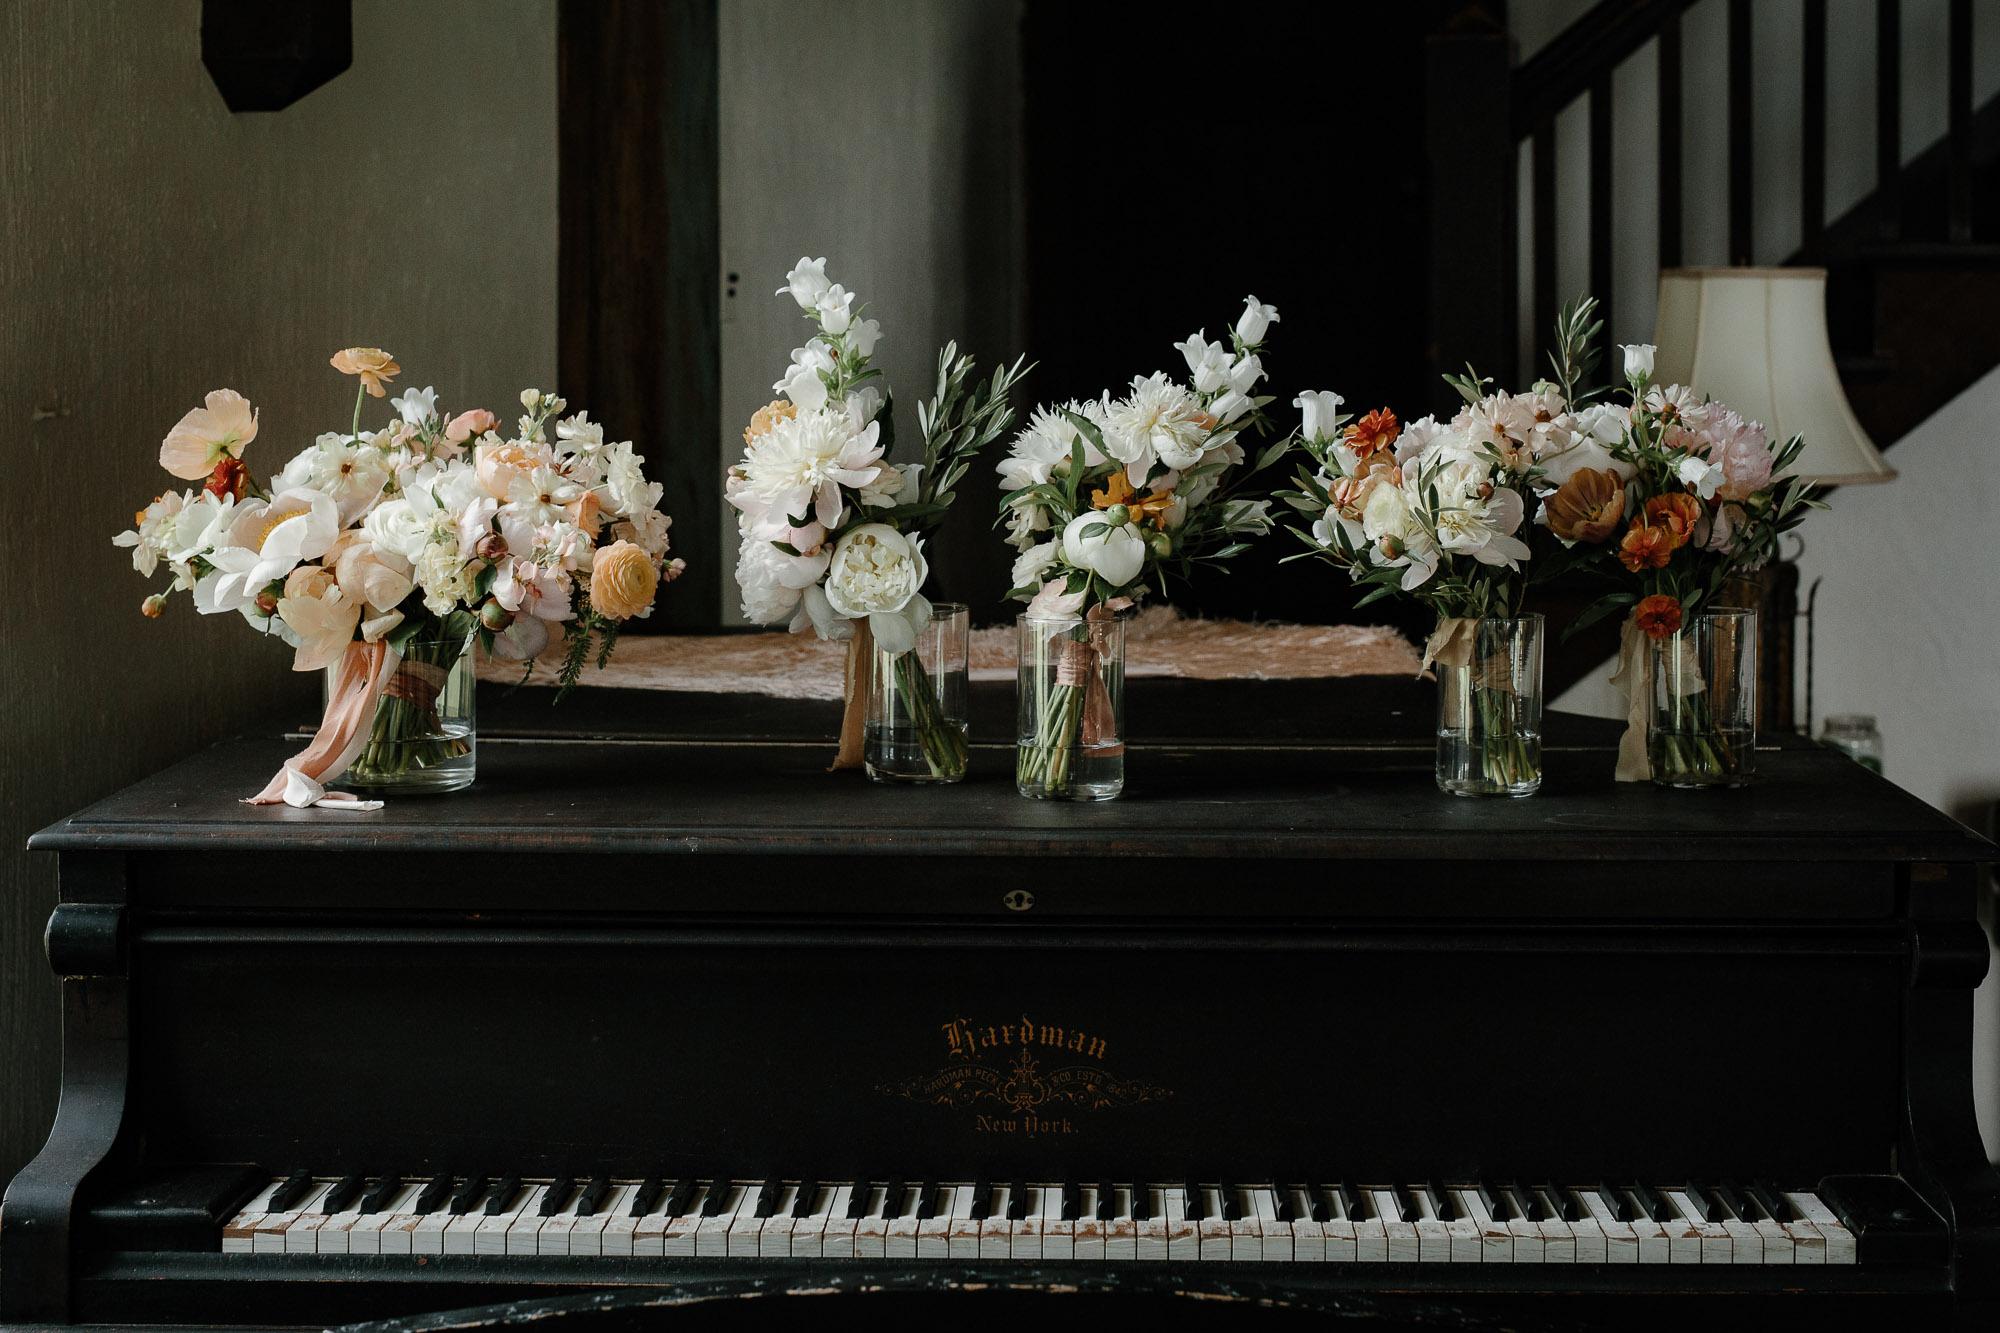 julia-nick-wedding-29.jpg